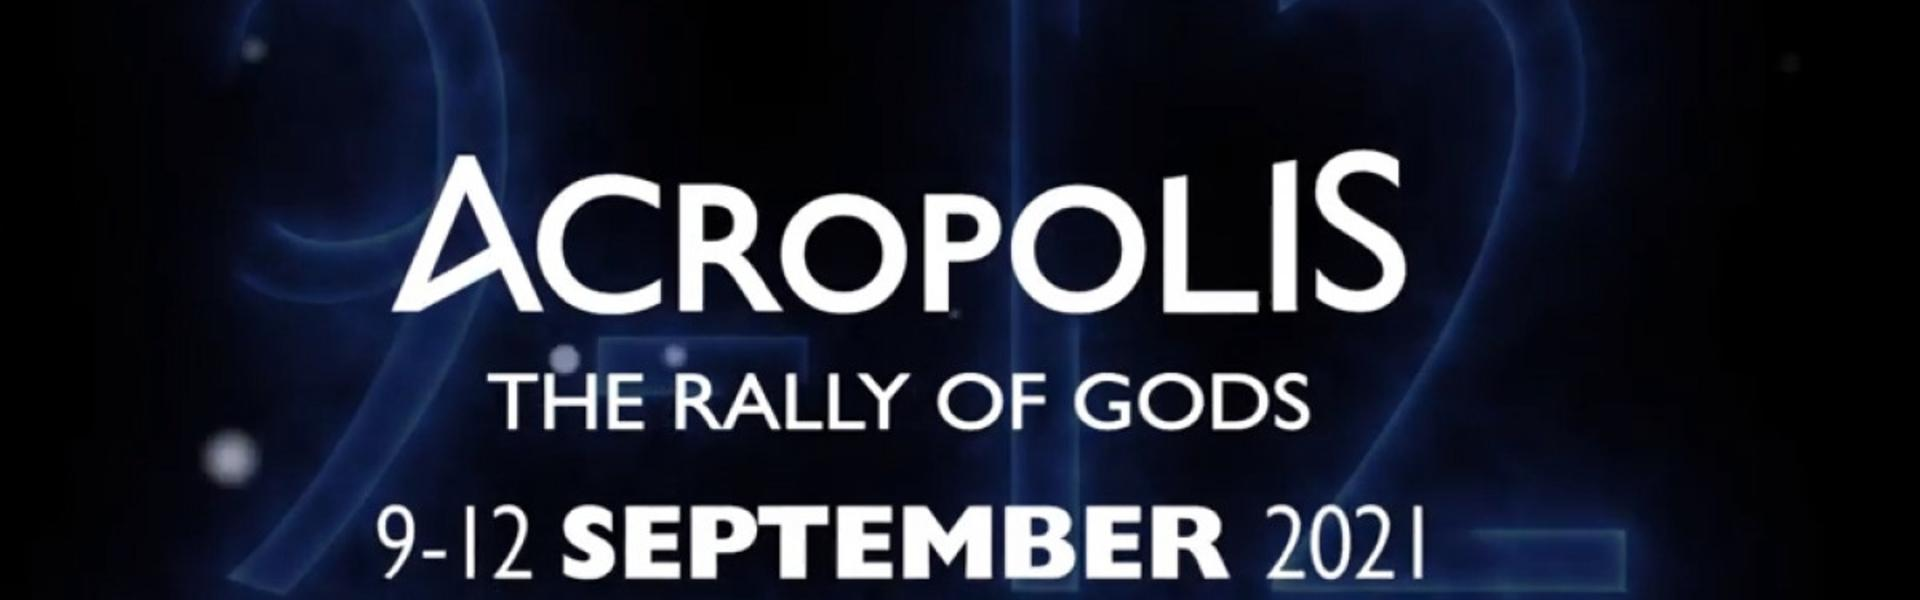 rally acropolis 2021